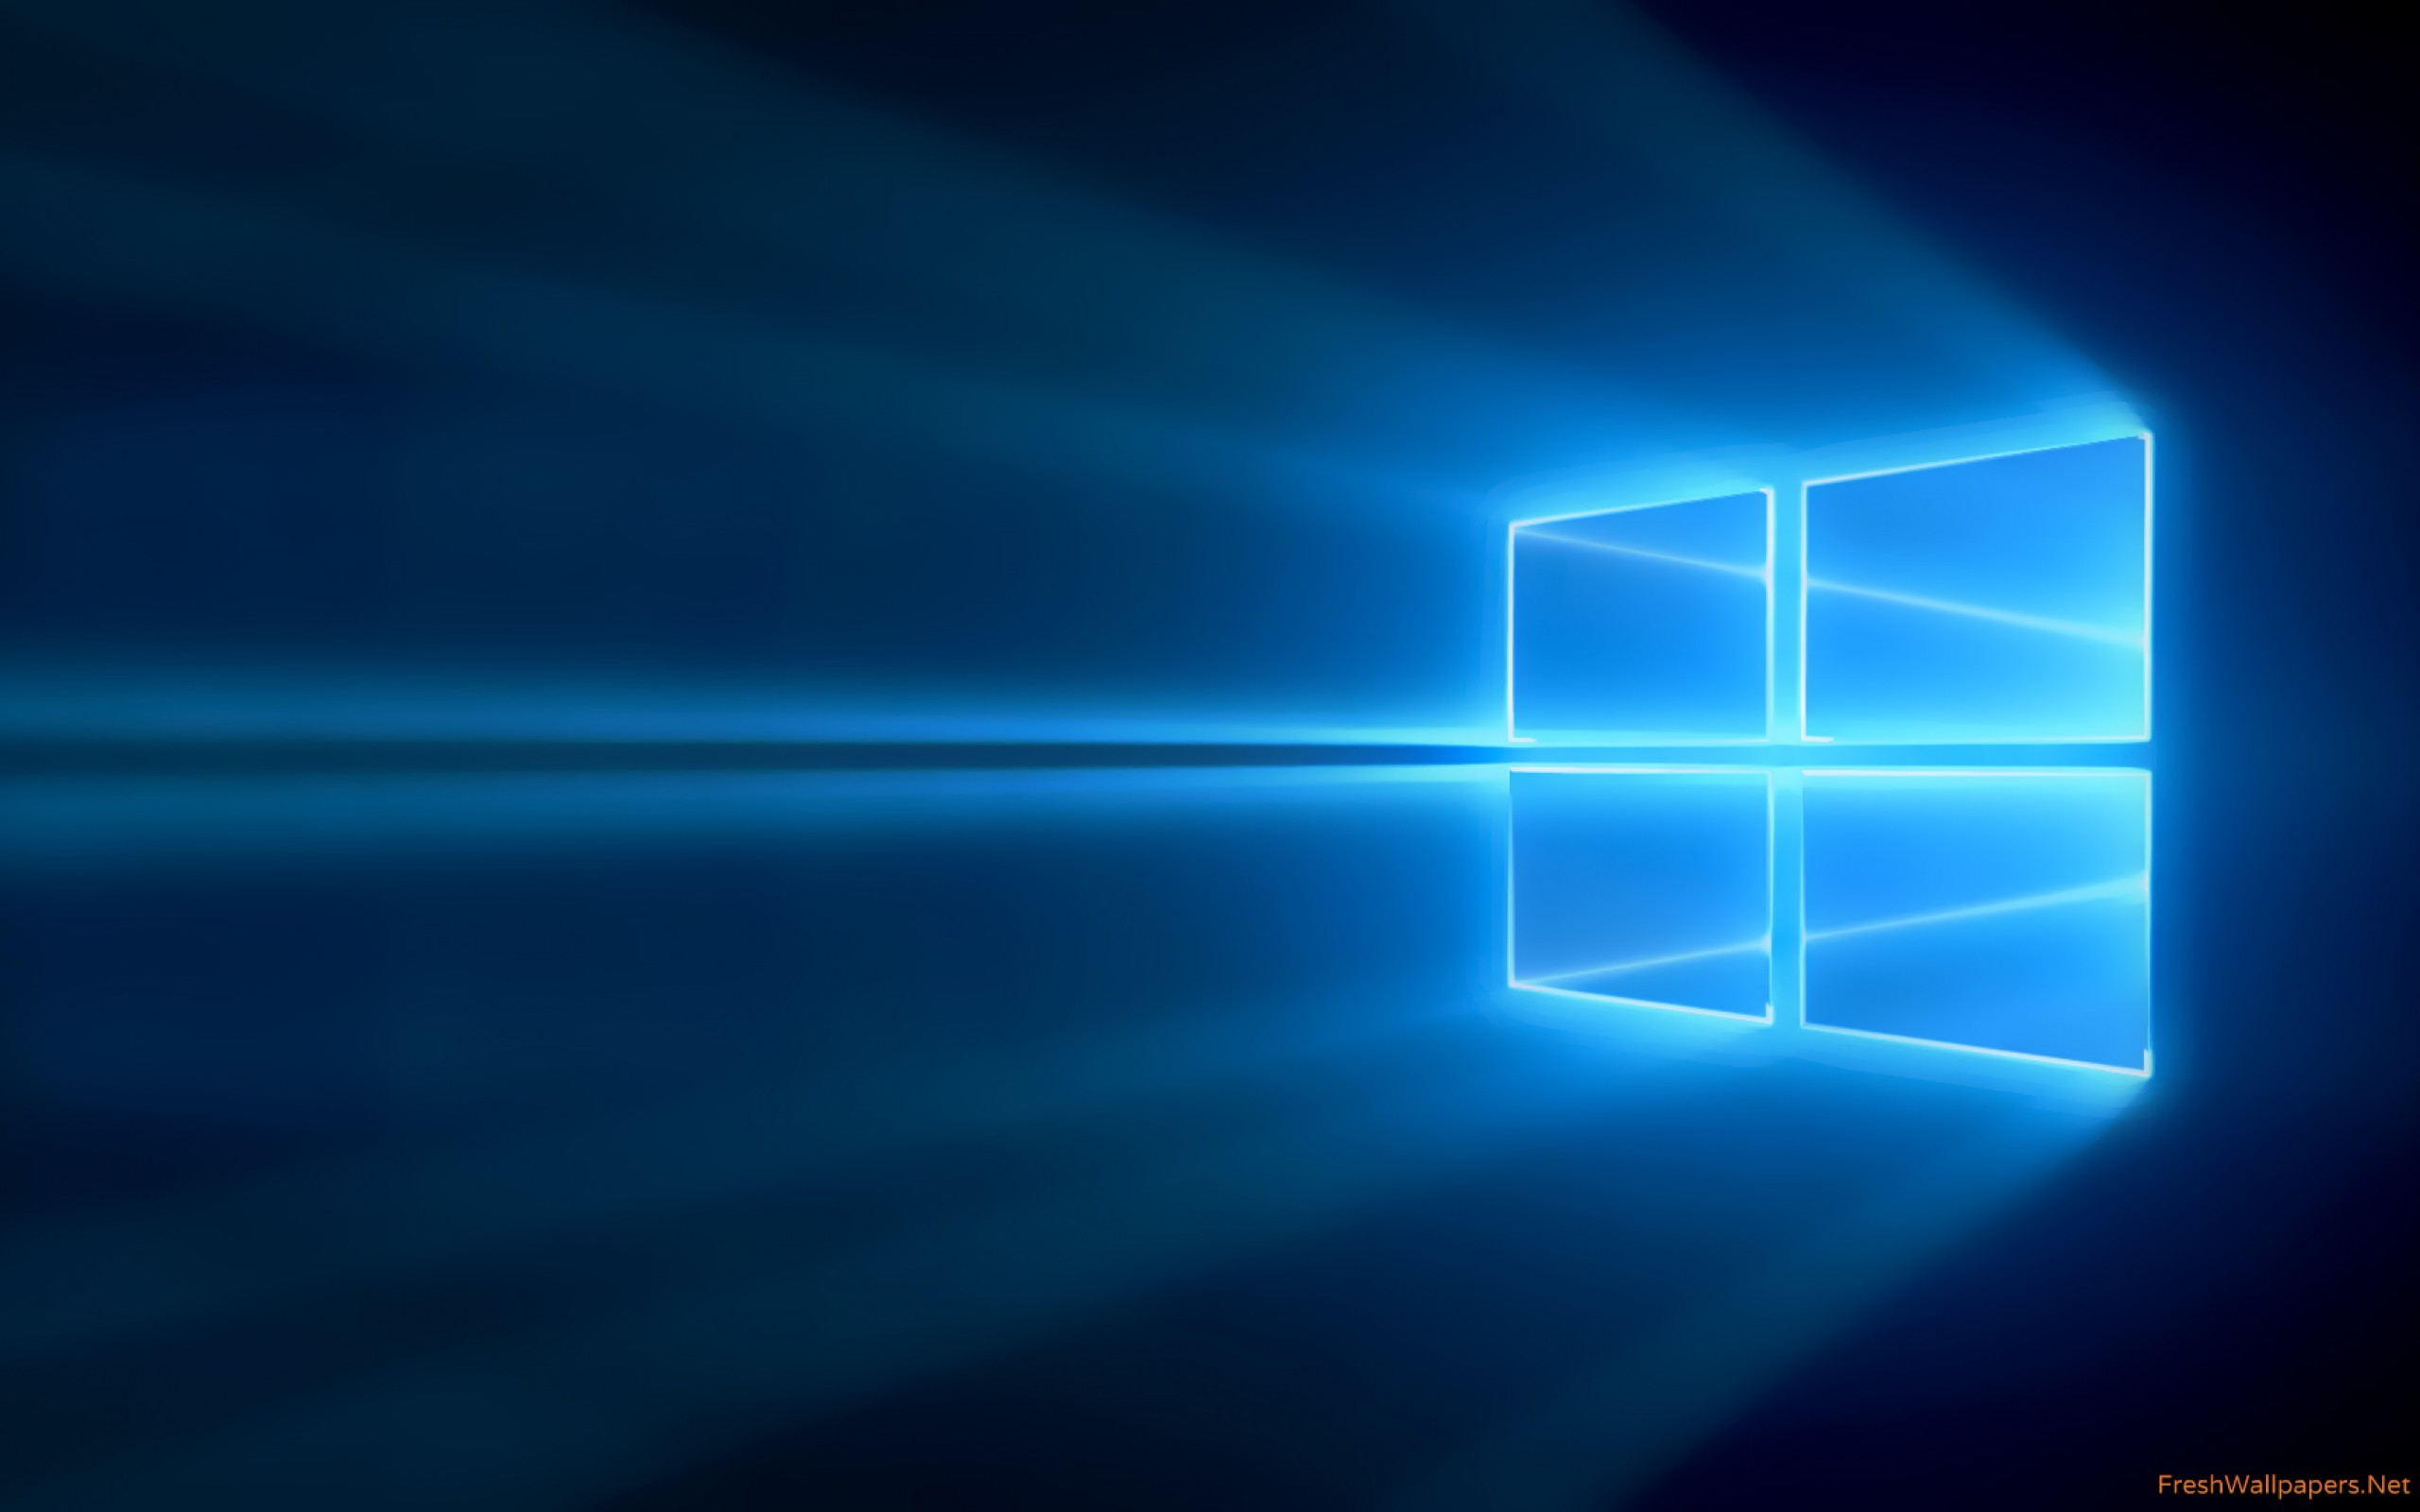 X Wallpaperswide Com Windows  Hd Desktop Wallpapers For  C B Download  C B Microsoft Windows Hd Desktop Wallpapers